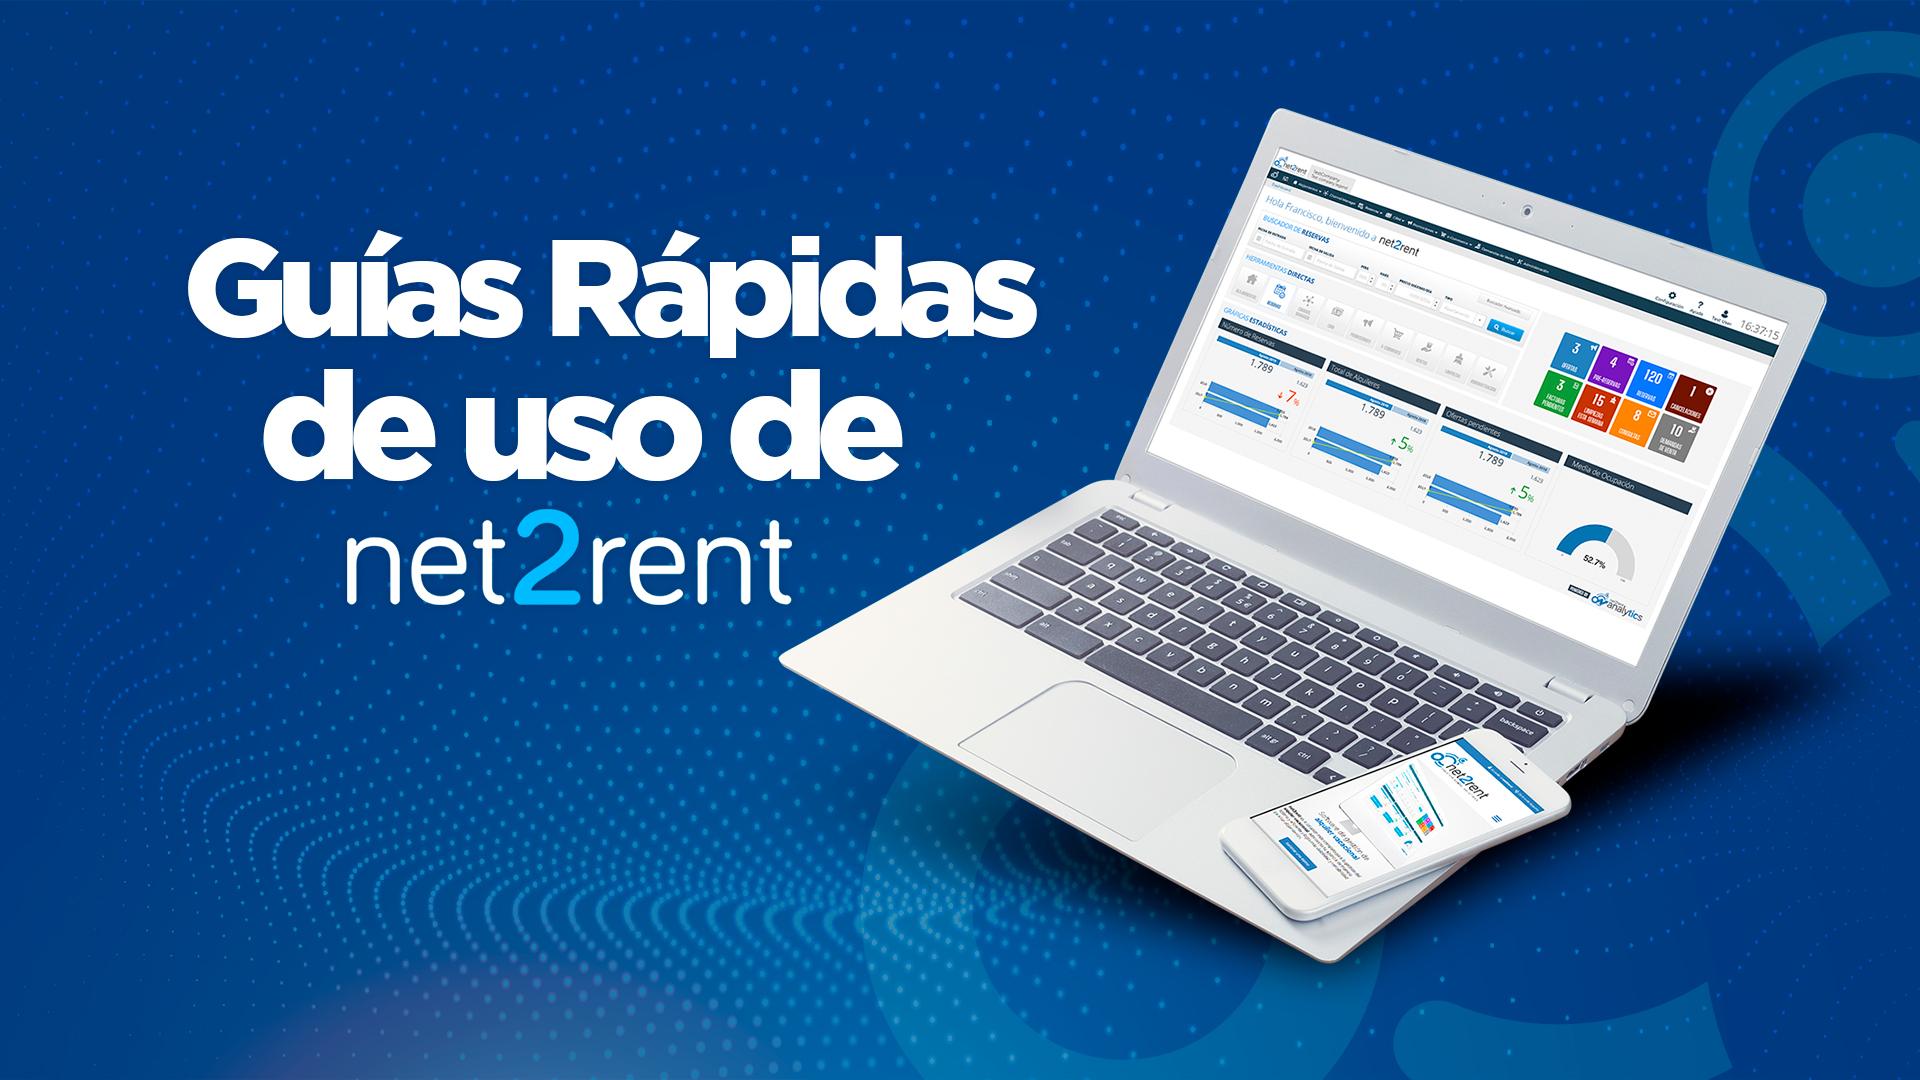 Guías rápidas de uso de net2rent